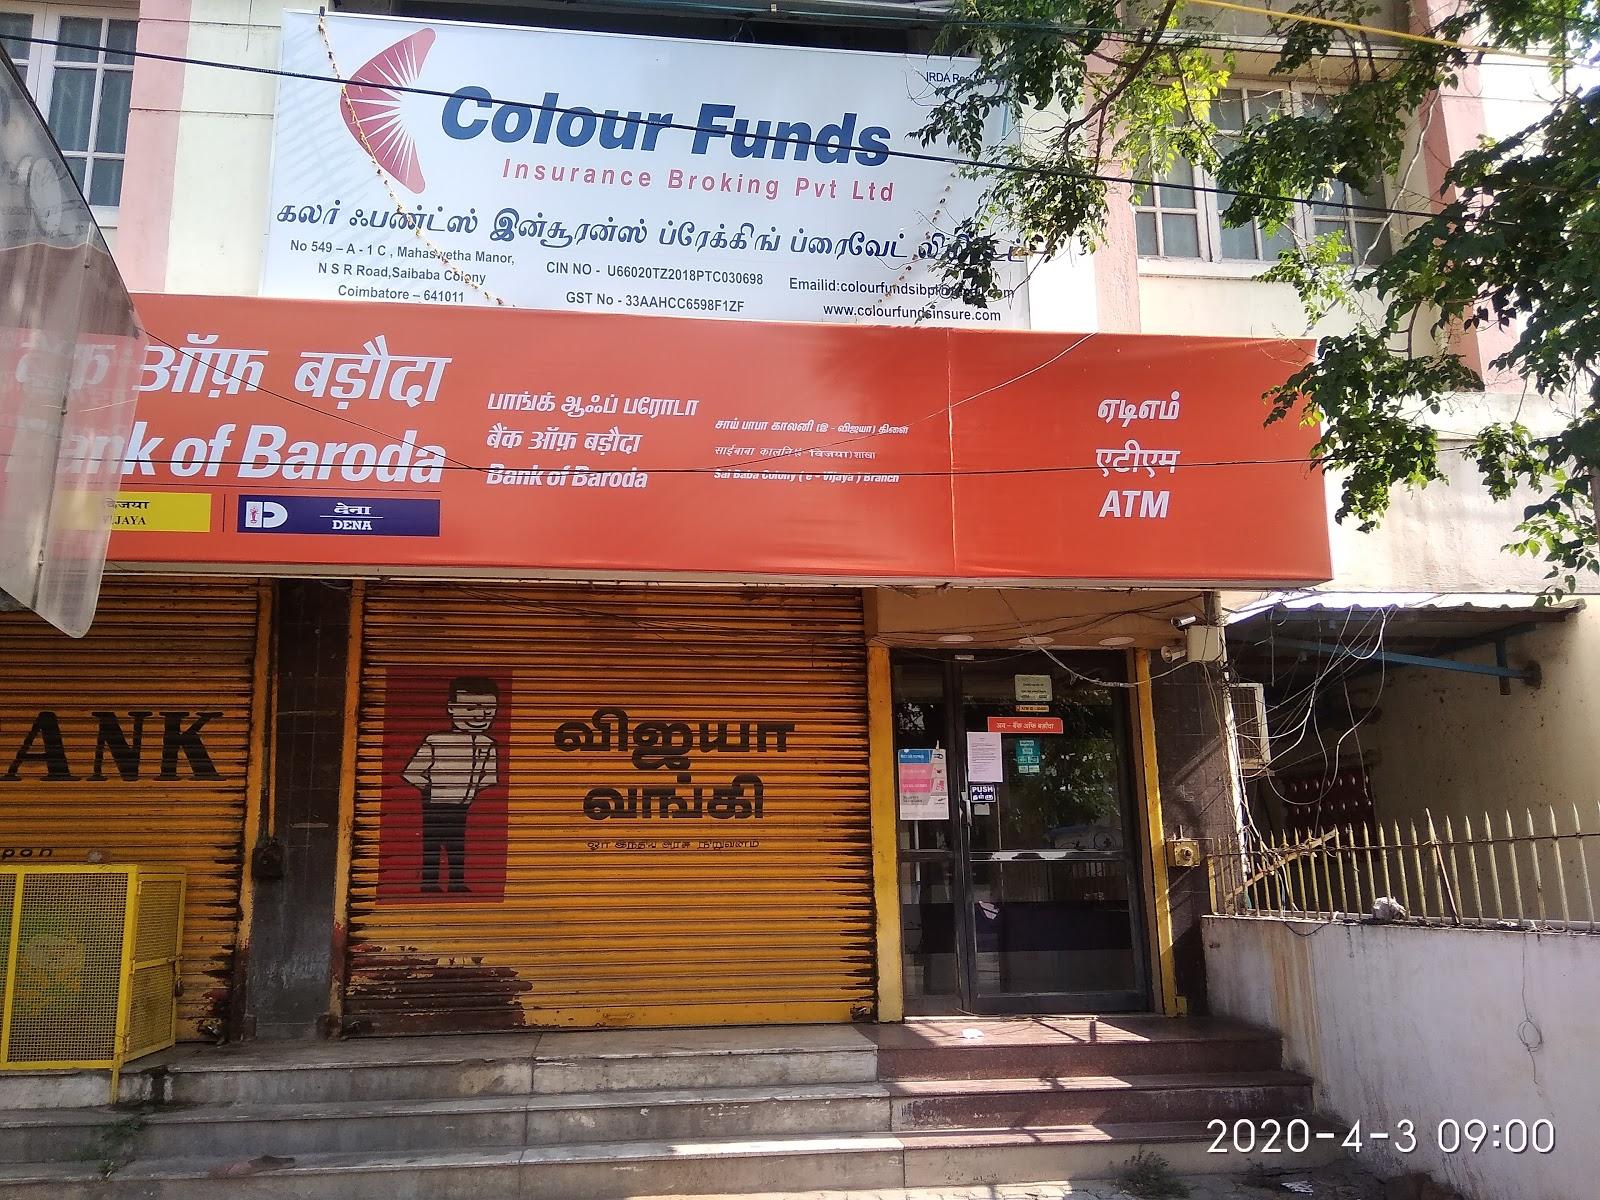 blood bank Bank Of Baroda near Saibaba Colony Tamil Nadu